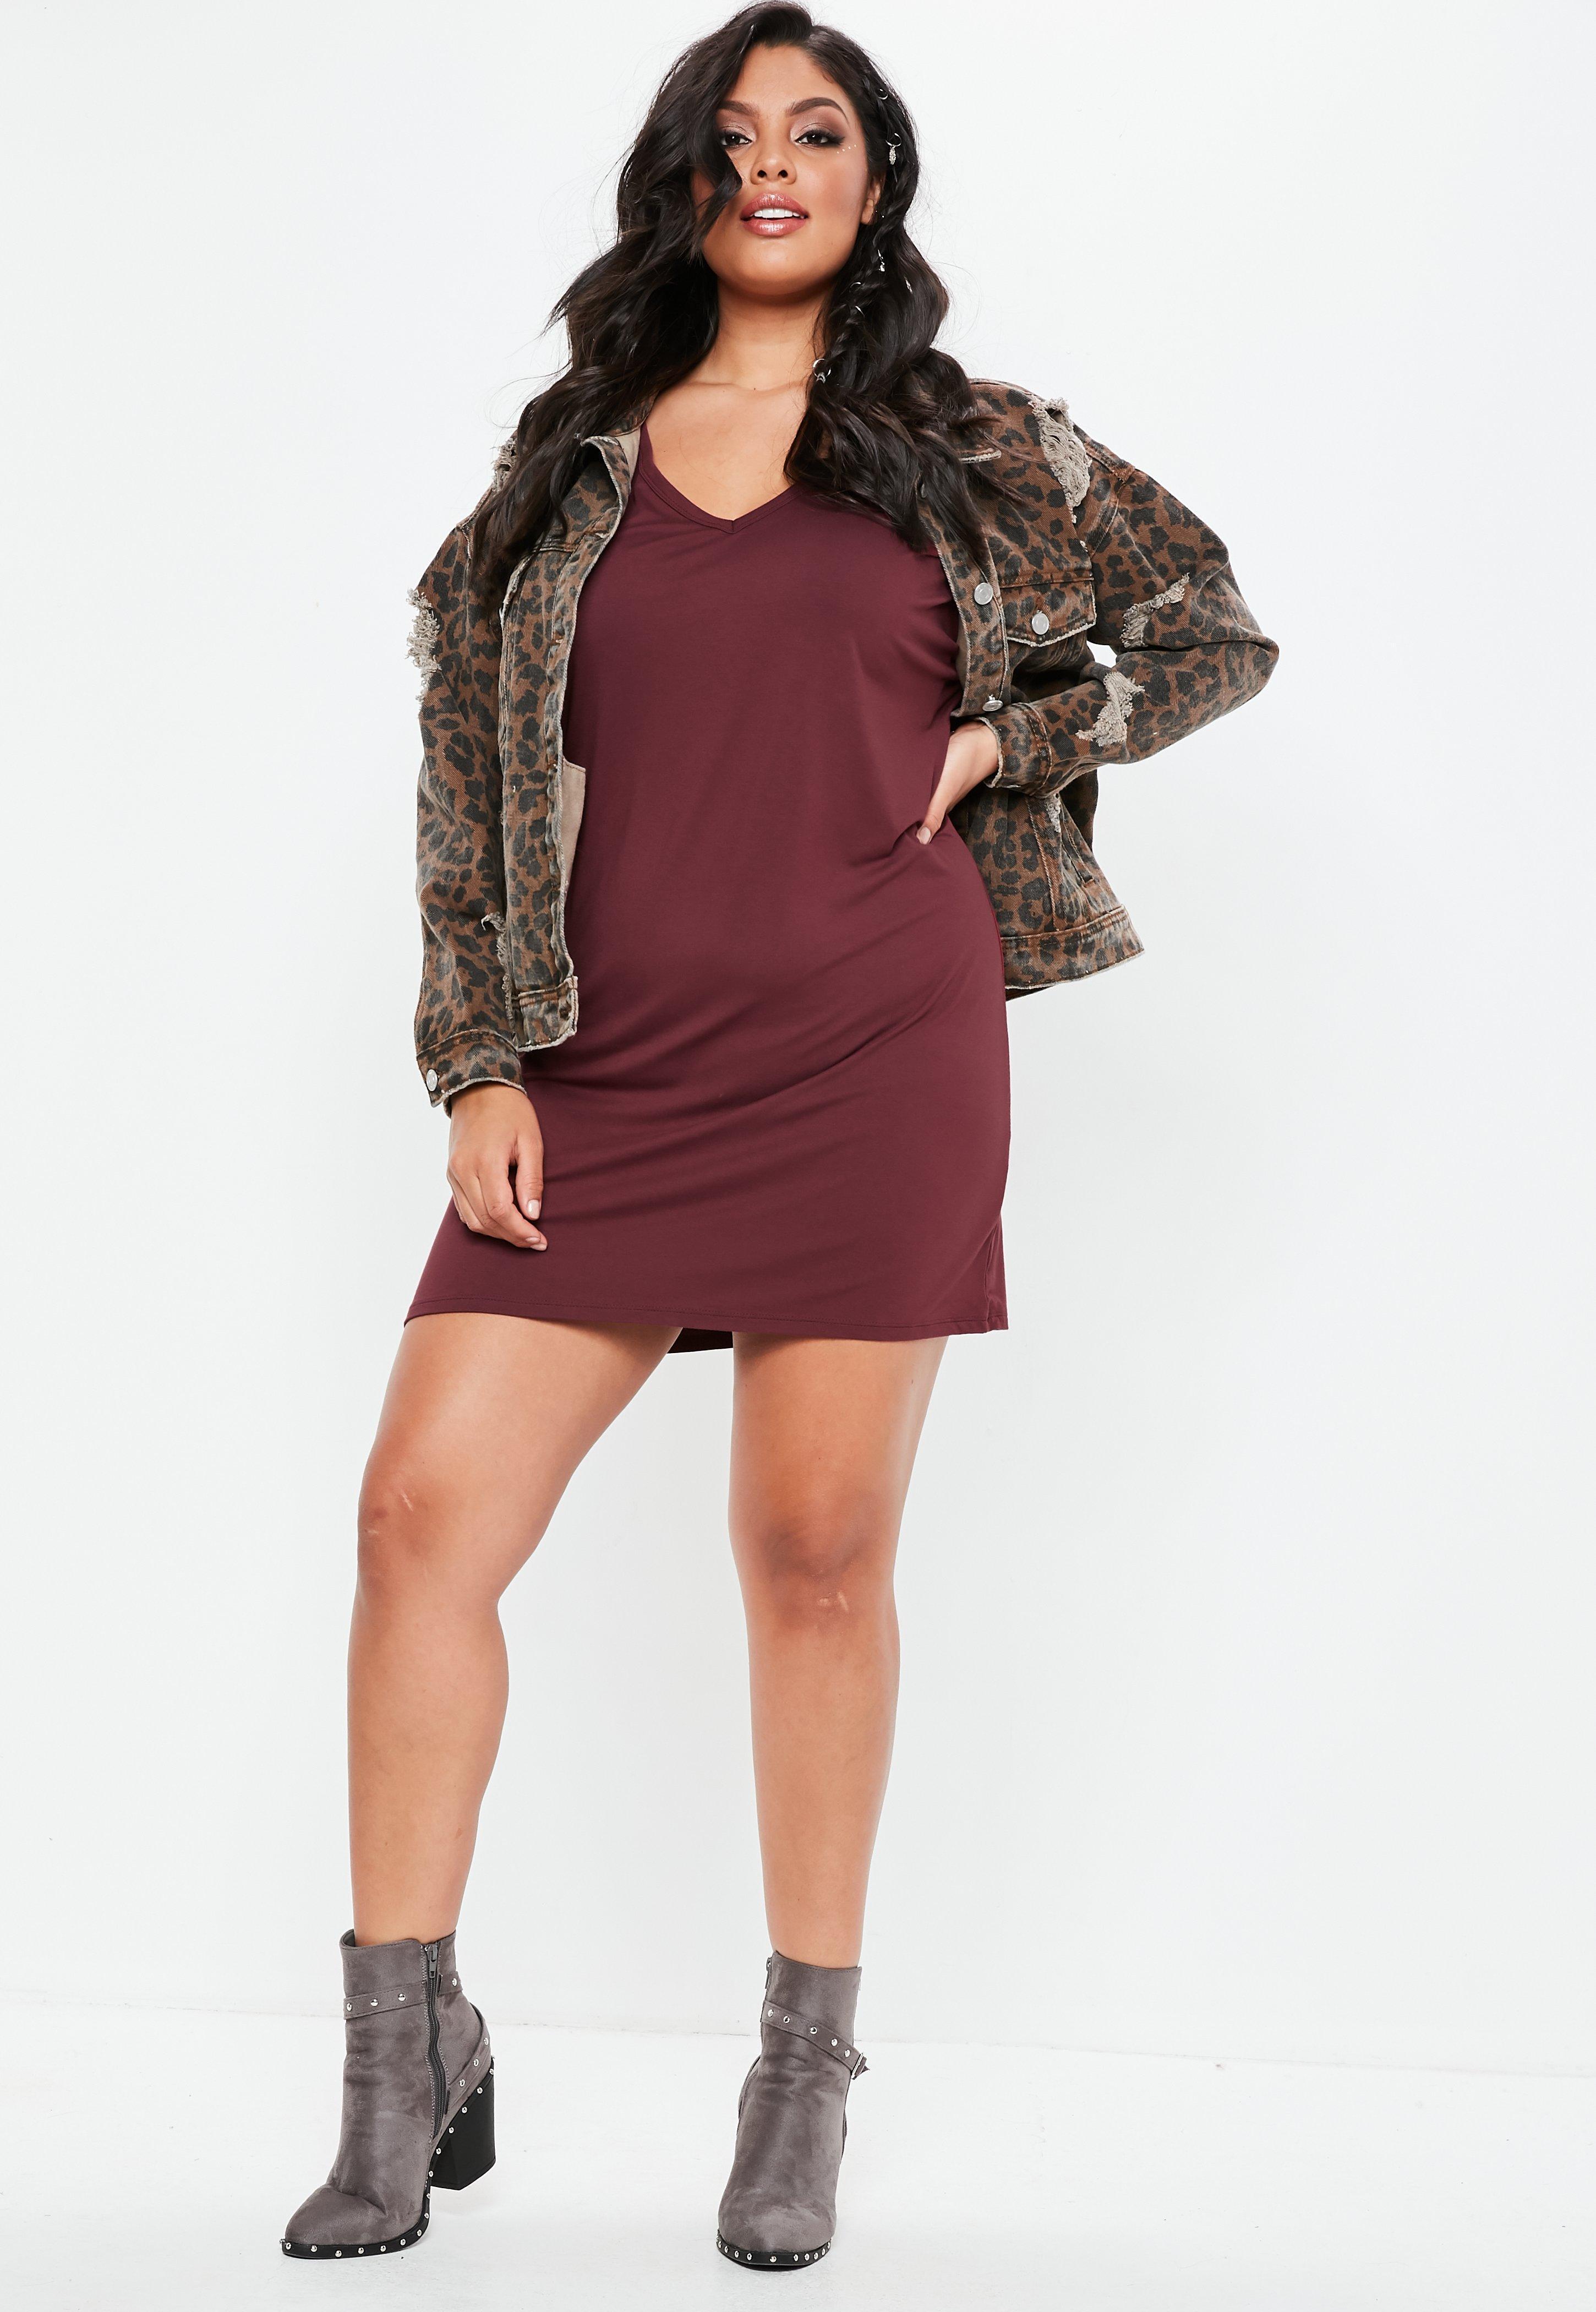 68c09fb2b4cf5 Oversized T Shirt Dress Plus Size